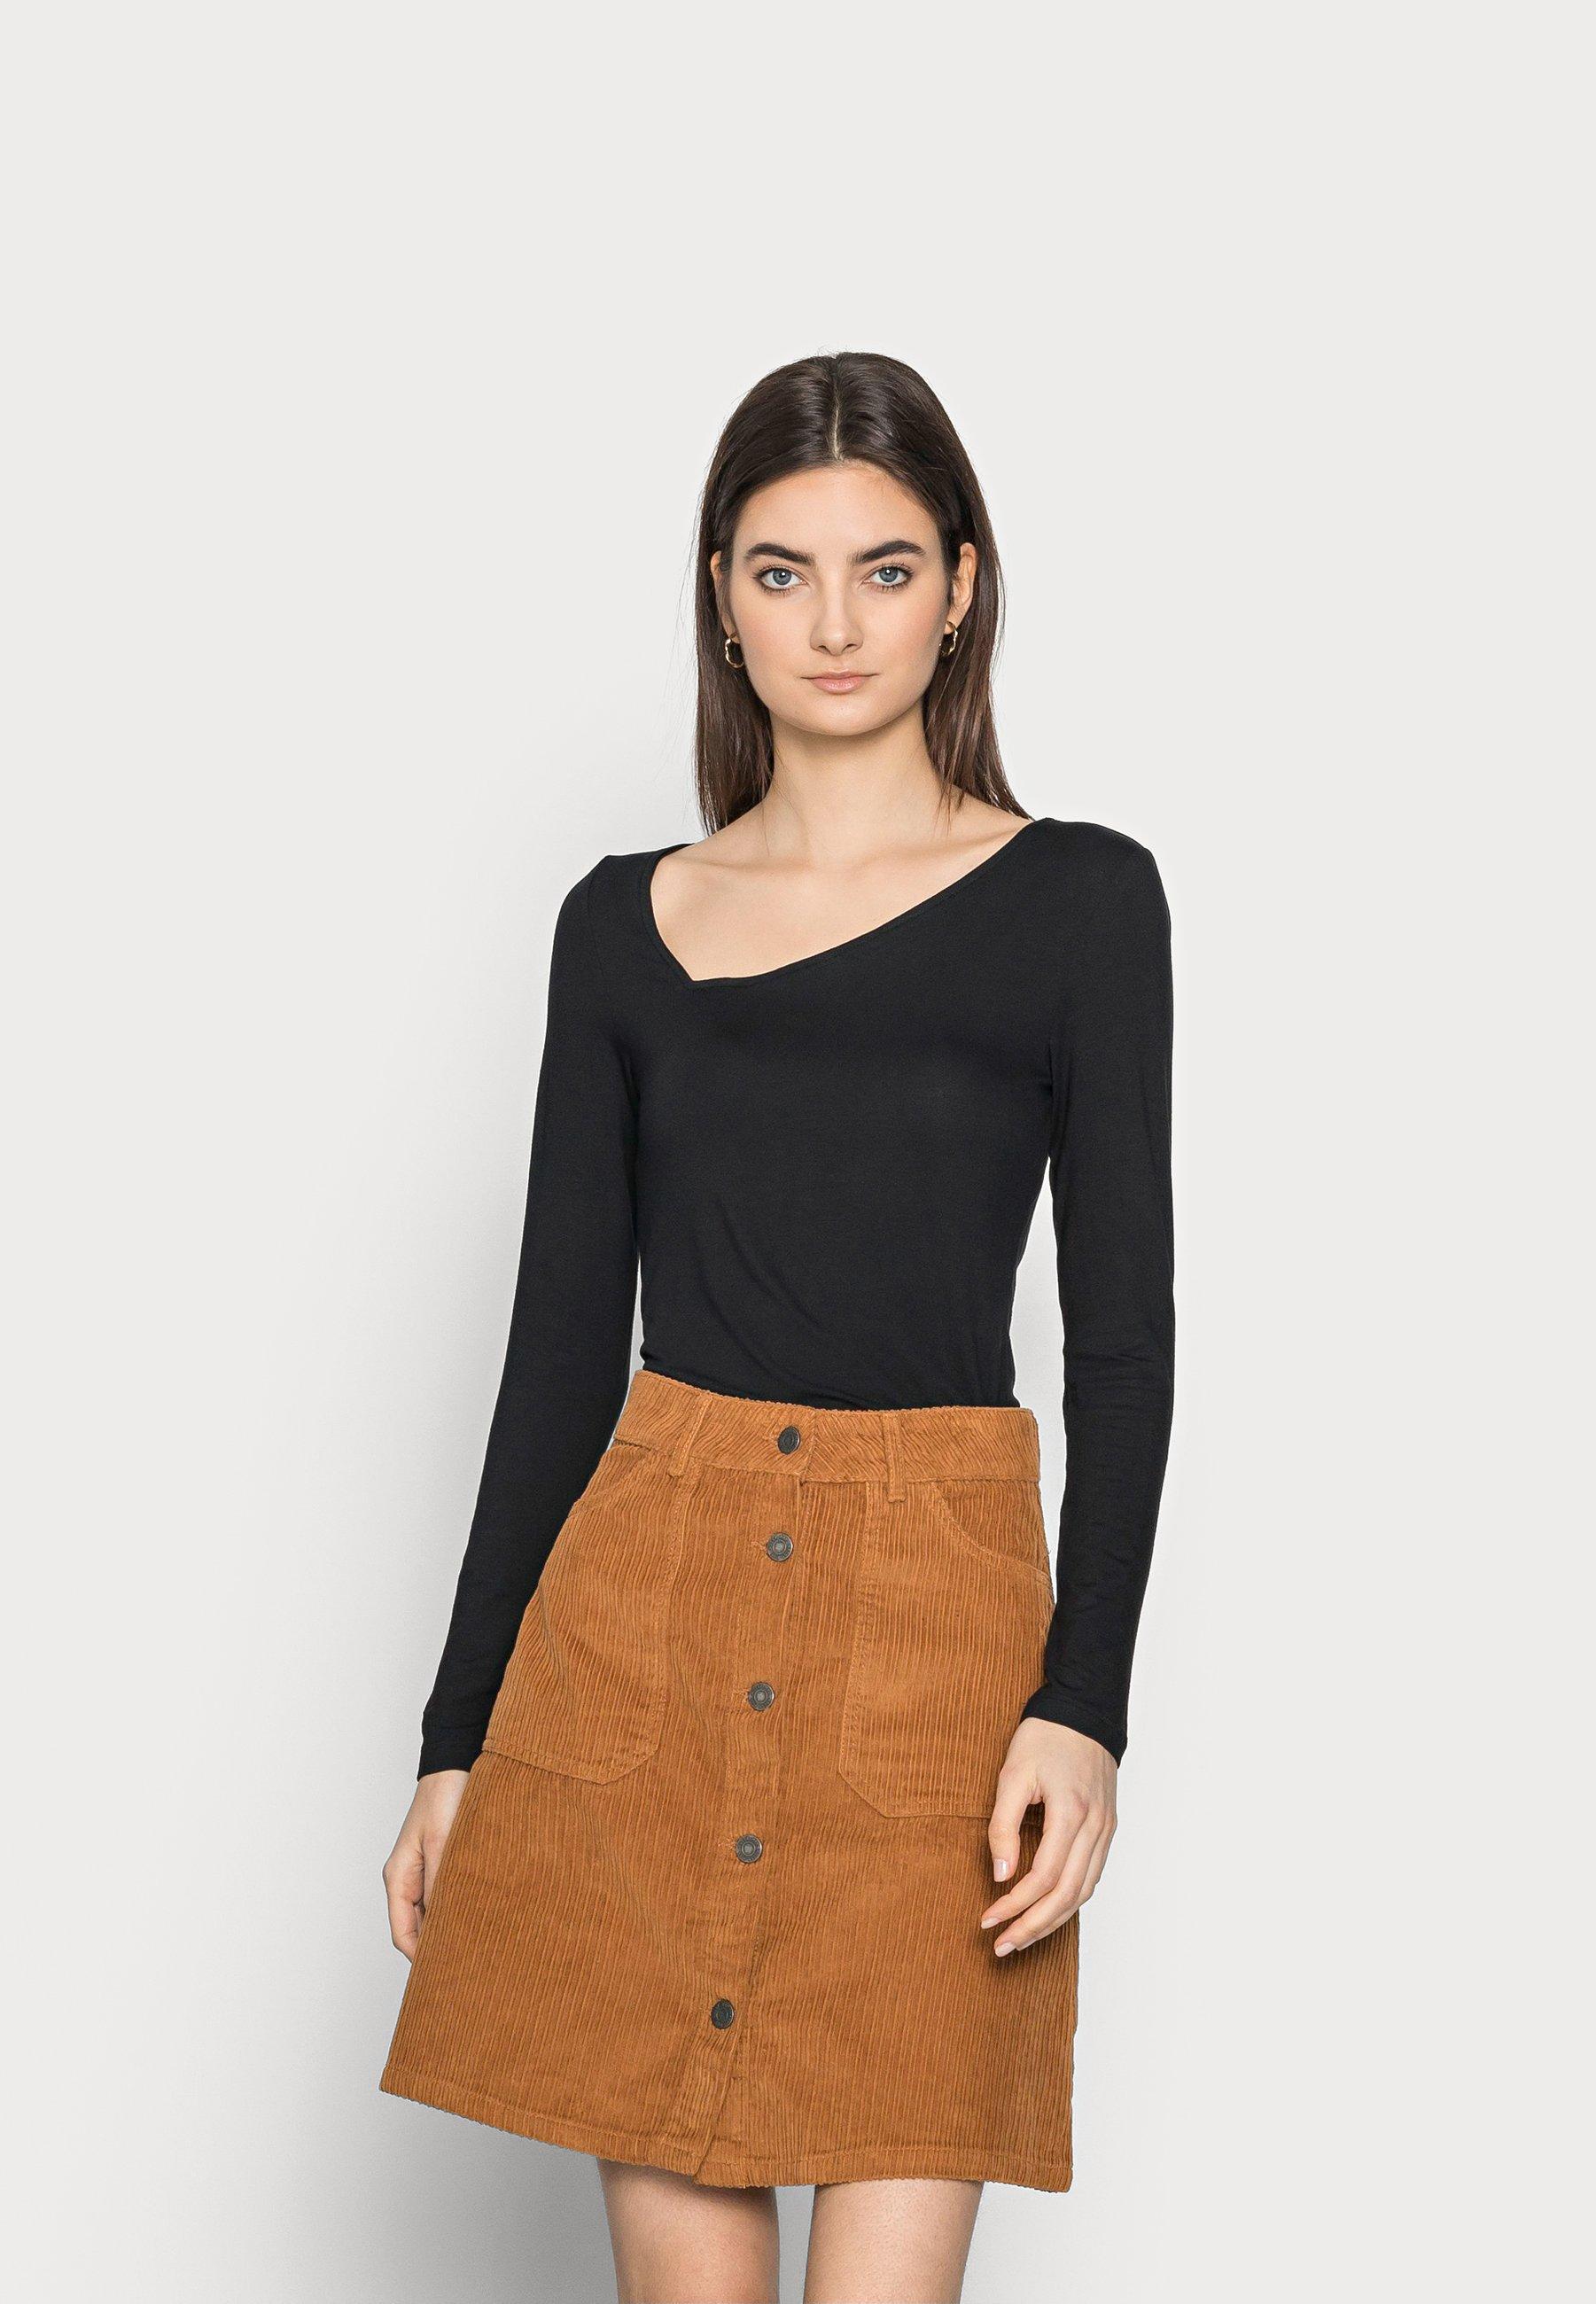 Women ASYMMETRIC NECKLINE - Long sleeved top